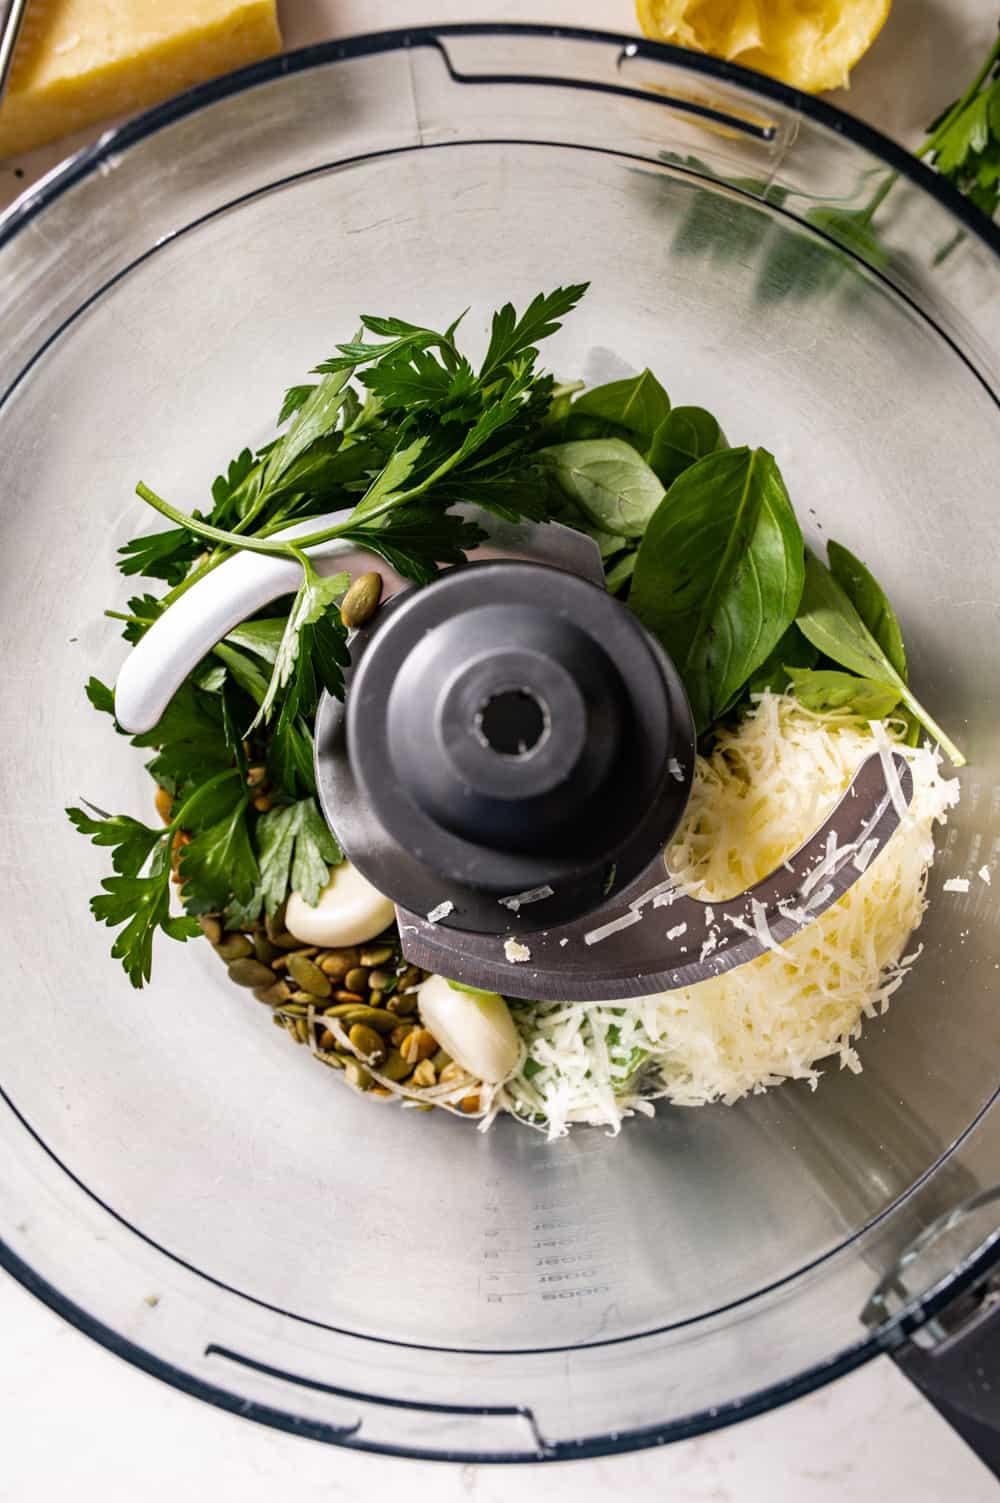 Overhead shot of nut-free pesto ingredients in a food processor